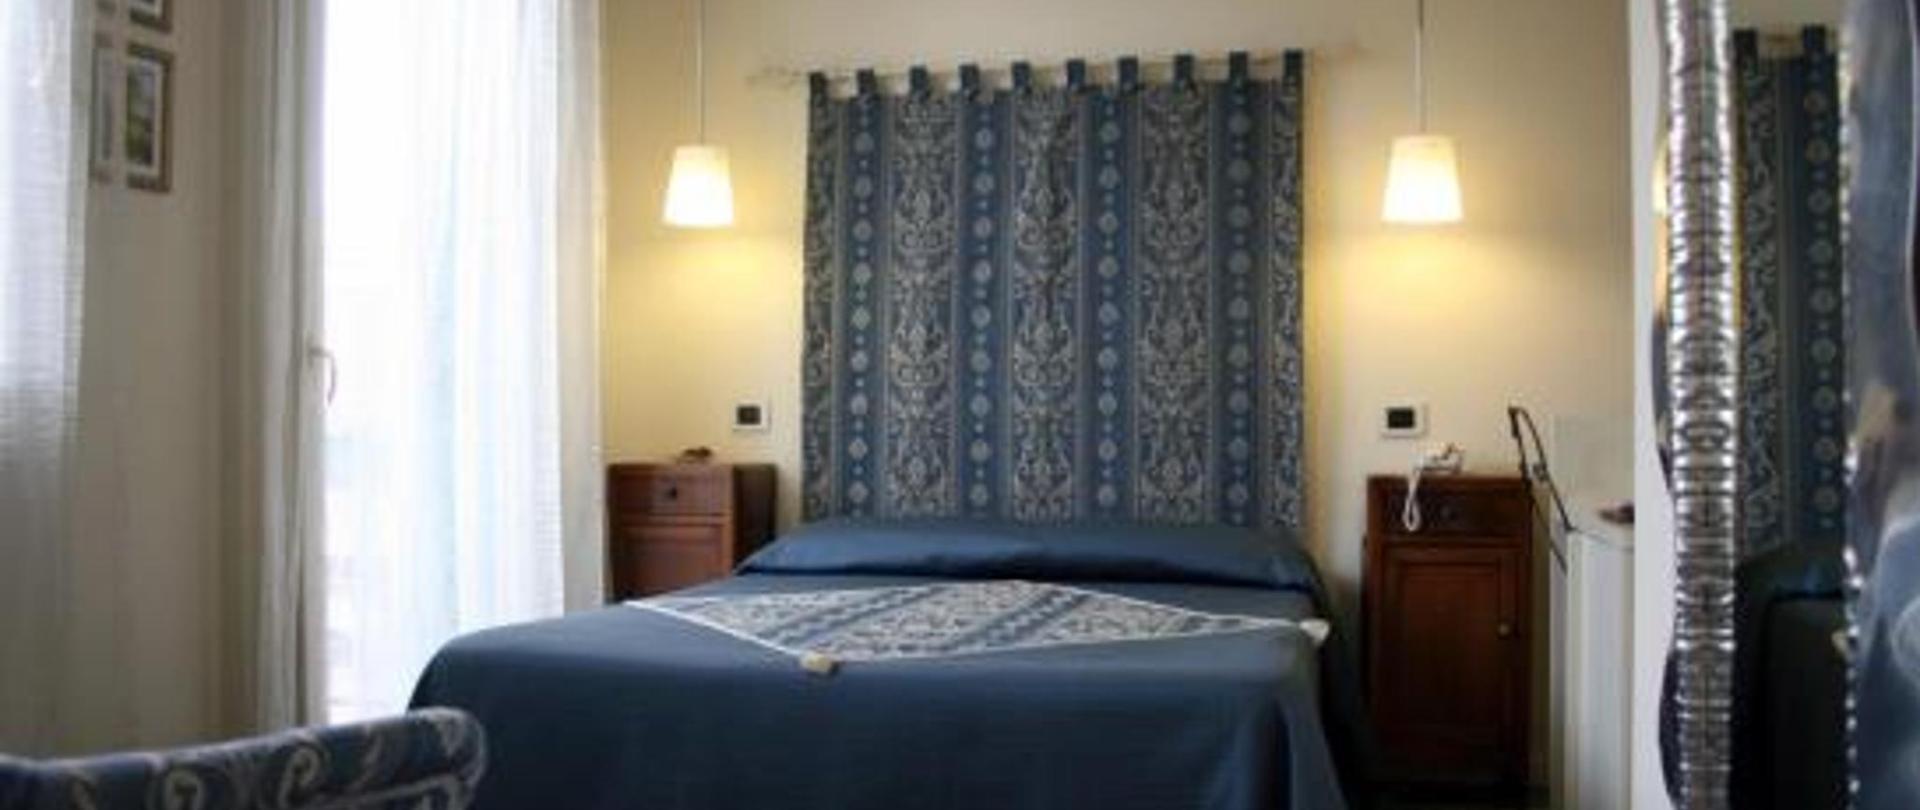 hotel-cristina-vicenza-015.jpg